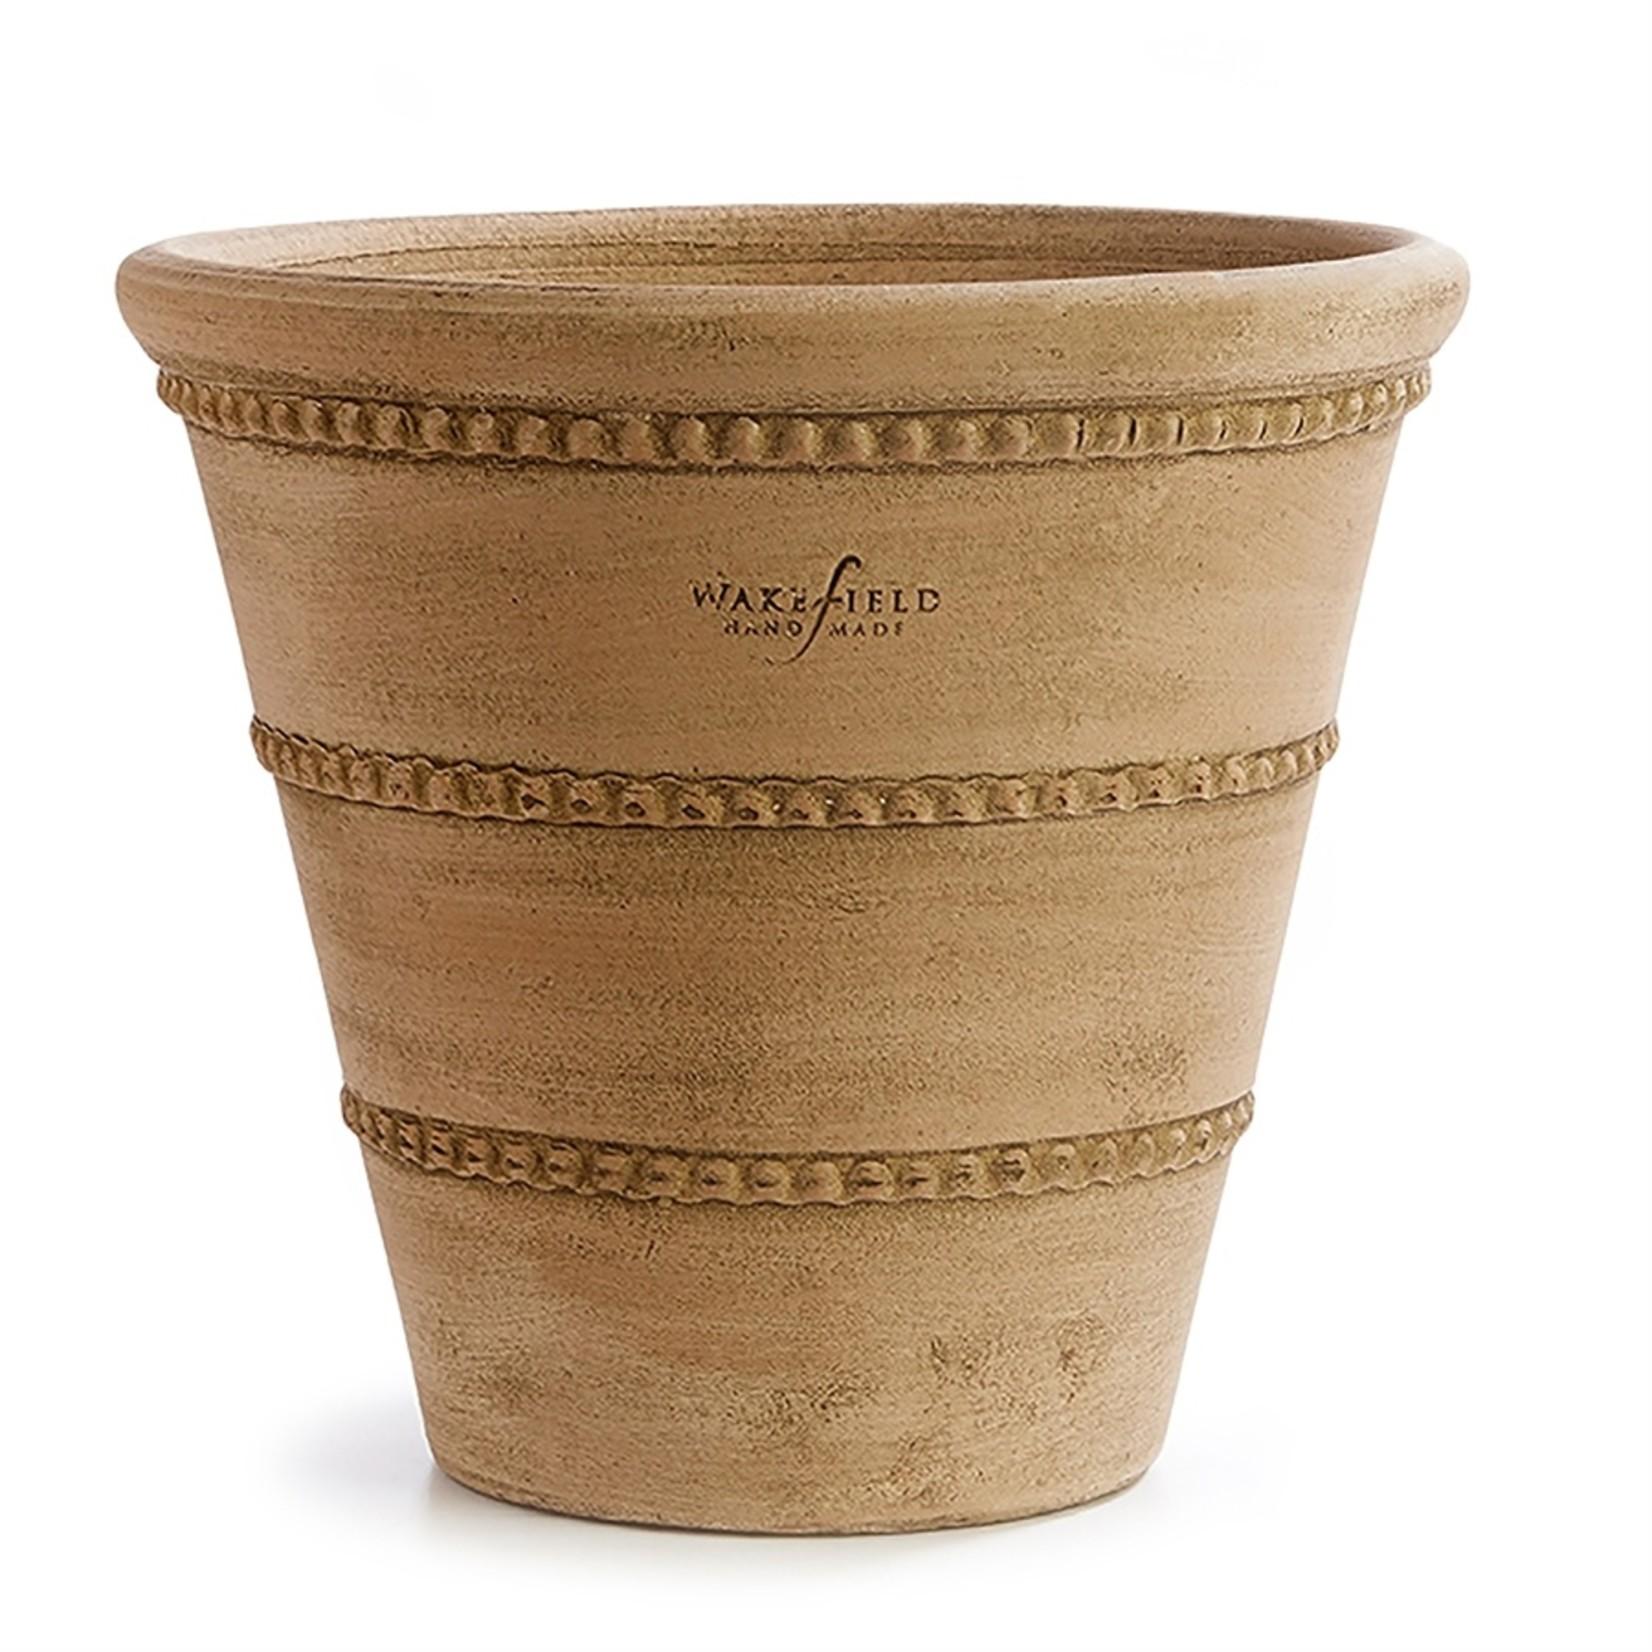 Napa Home and Garden Wakefield Handmade Oldham Pot